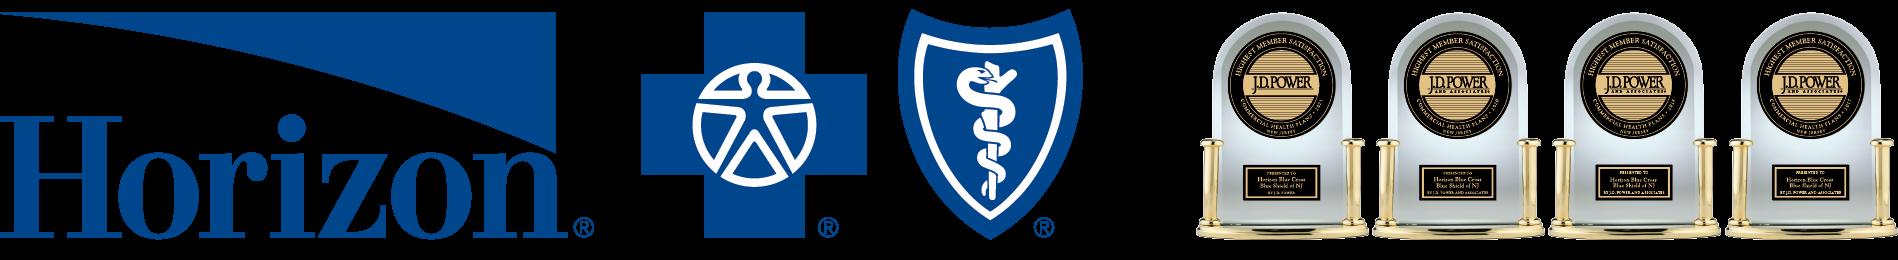 The Horizon Blue Cross Blue Shield Logo with JD Power